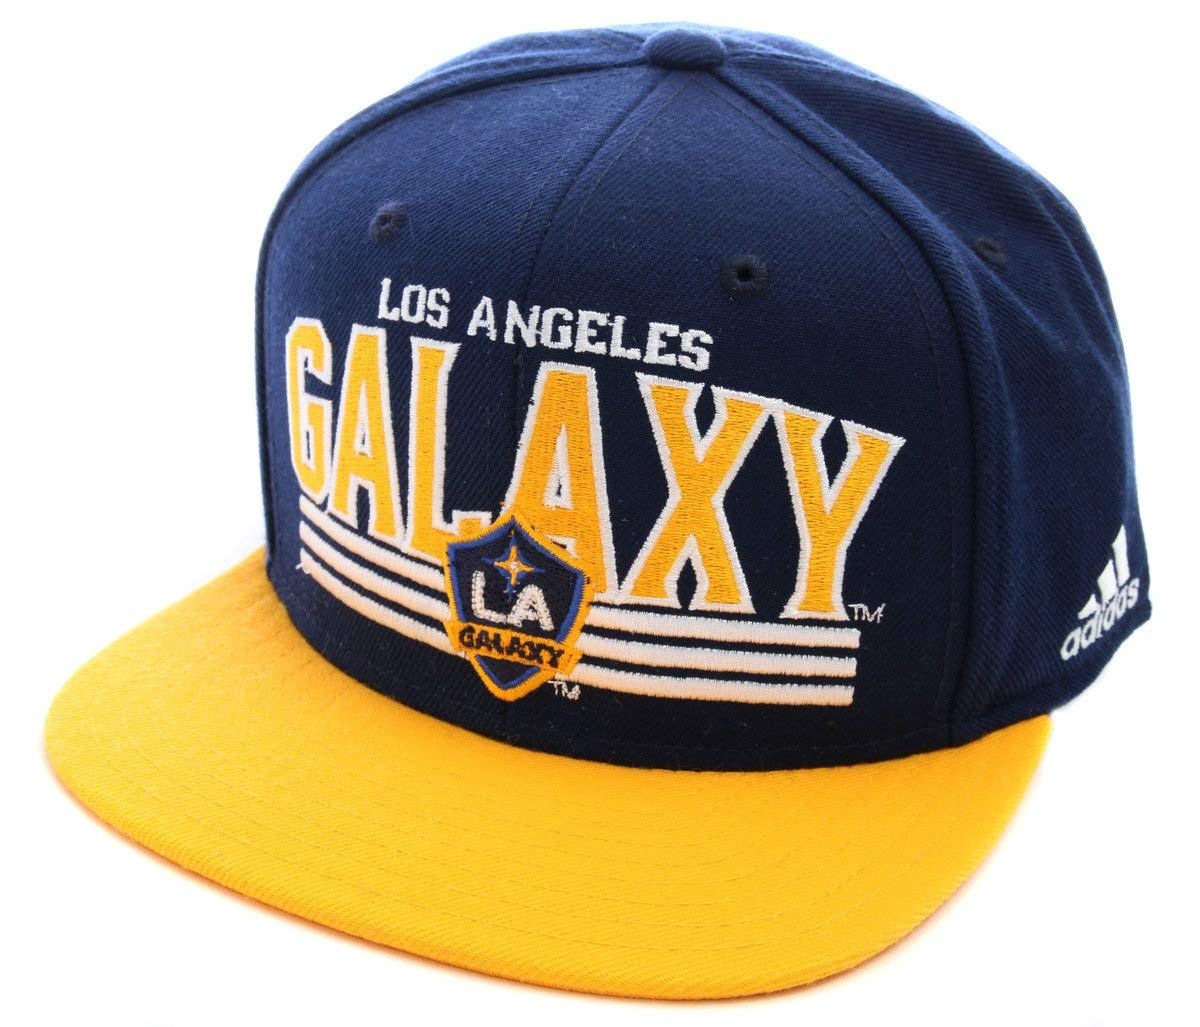 hot sale online e5924 7063c ... coupon code for amazon mls los angeles galaxy snapback adidas hat osfa  np01z sports fan baseball